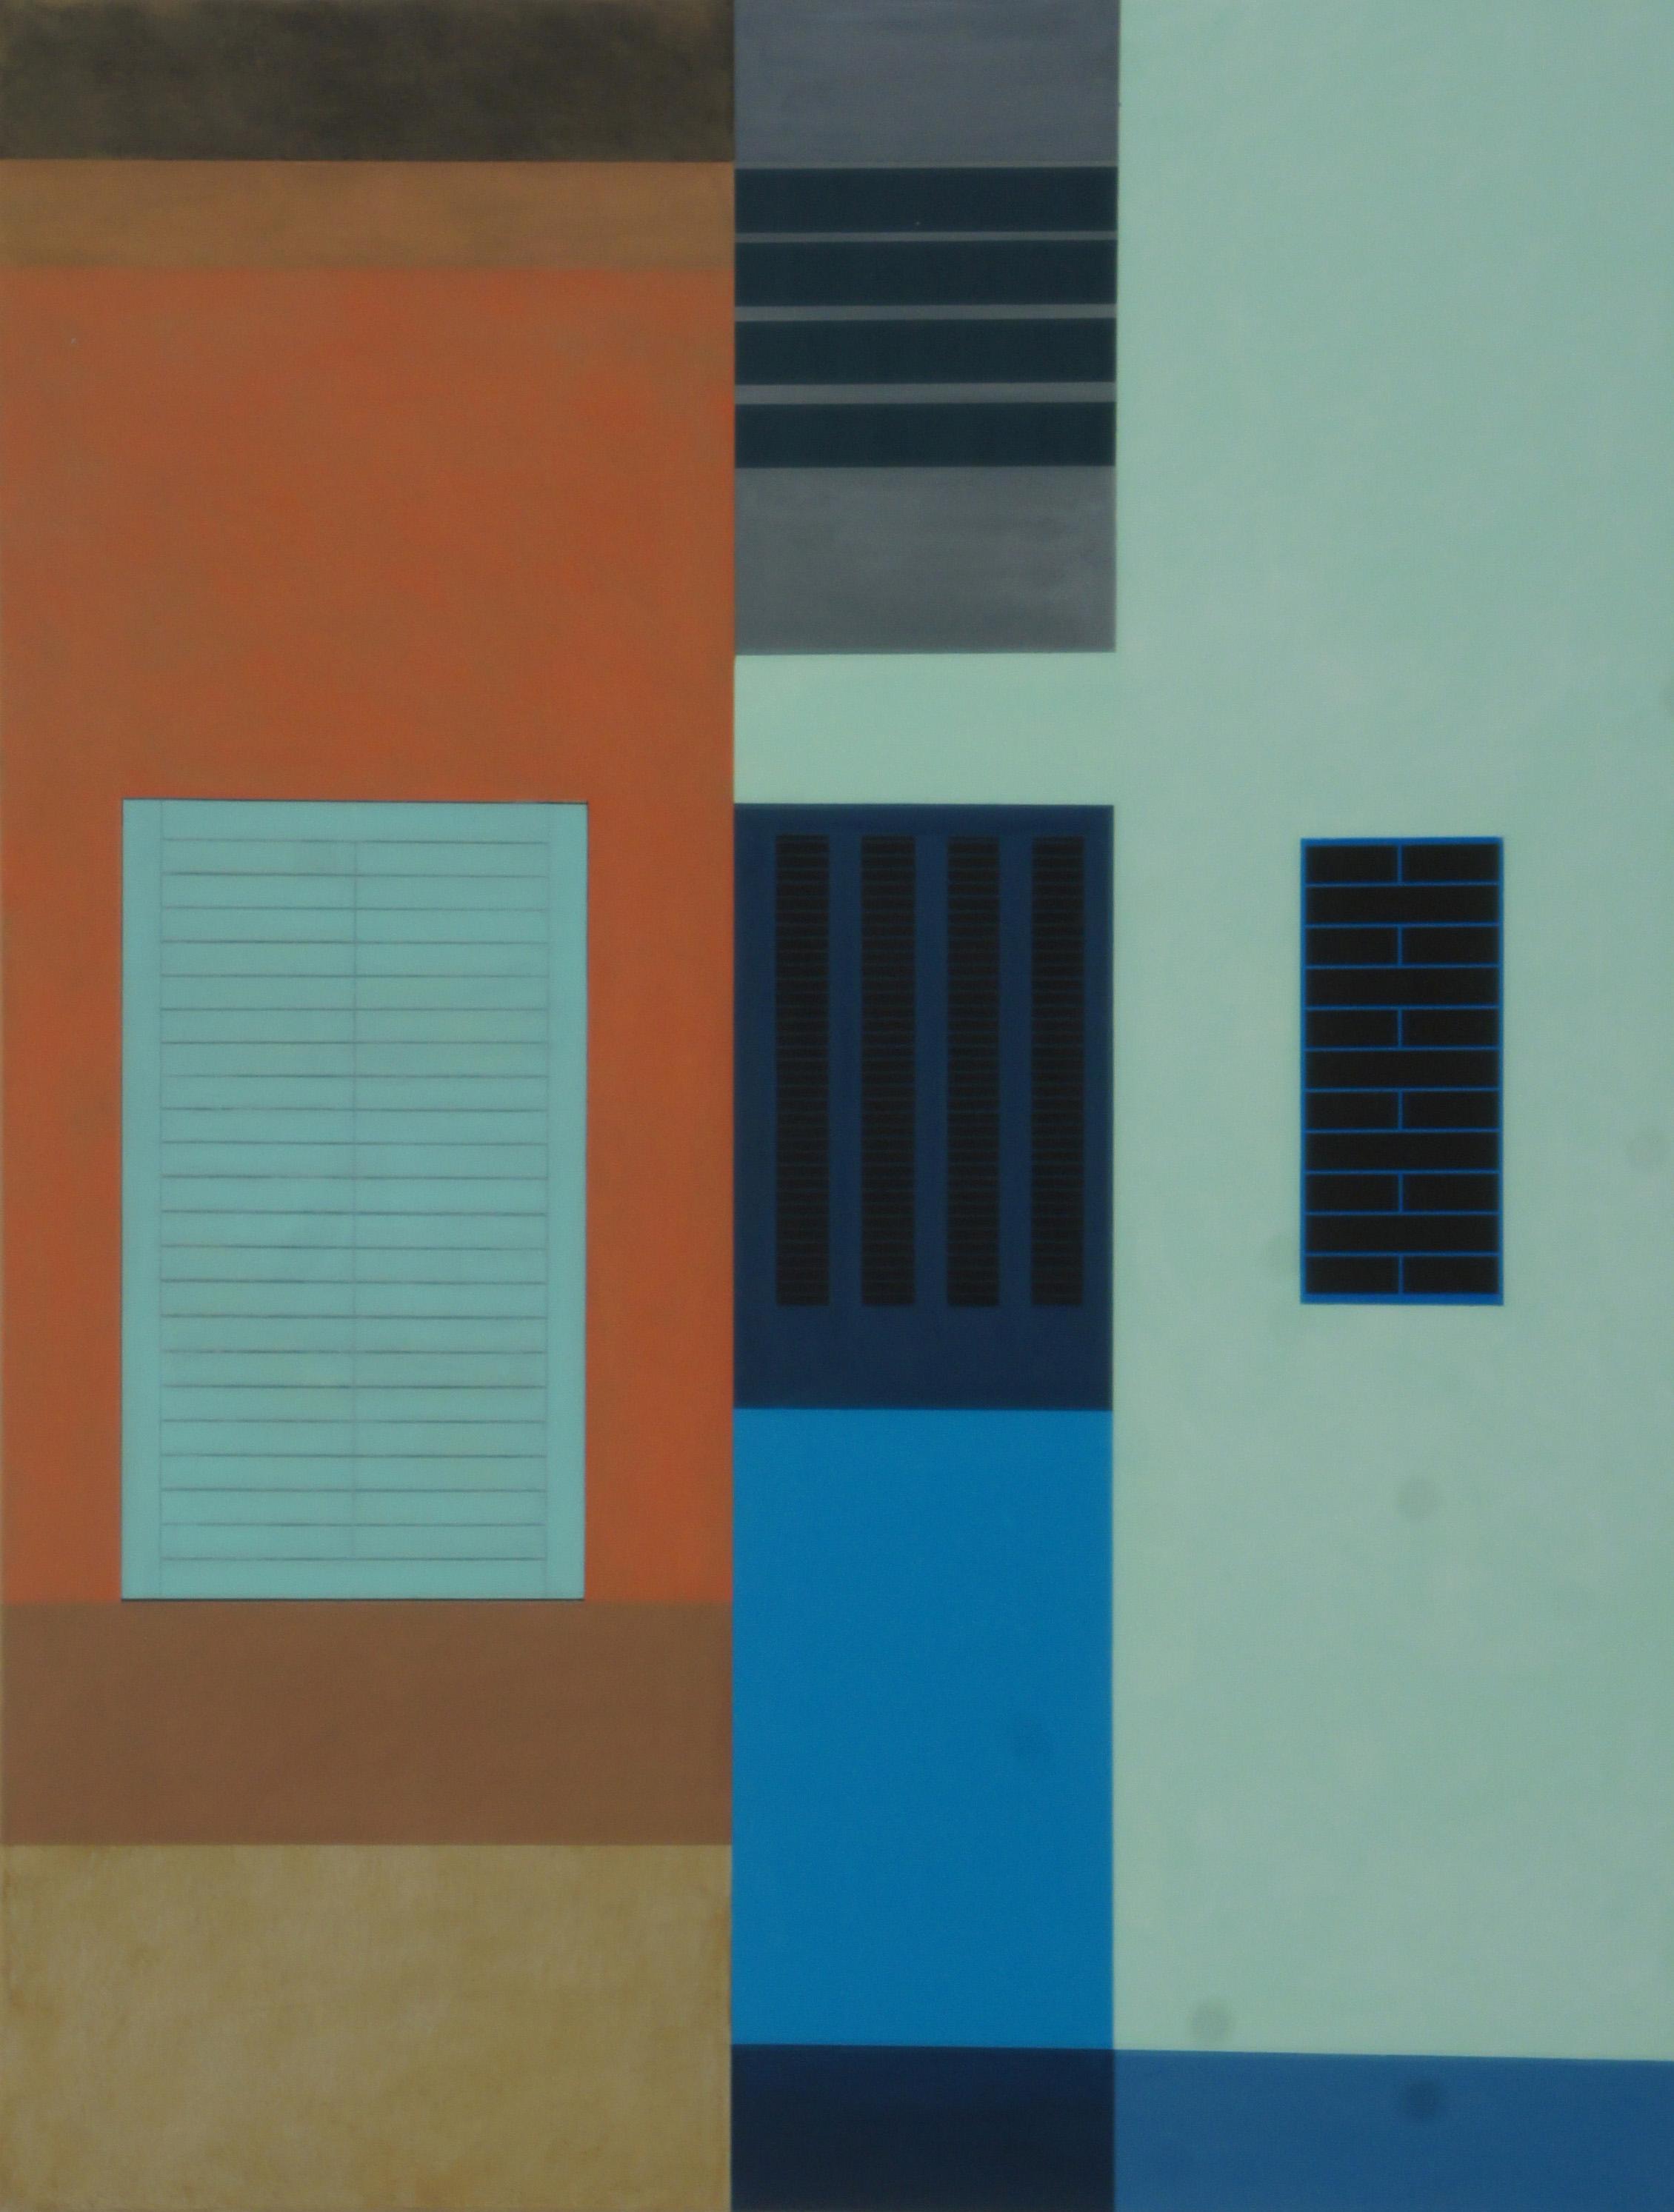 In Varanasi, 2011, 105 x 80 cm, Ölfarbe auf Leinwand In Varanasi, 2011, 105 x 80 cm, Oil on canvas